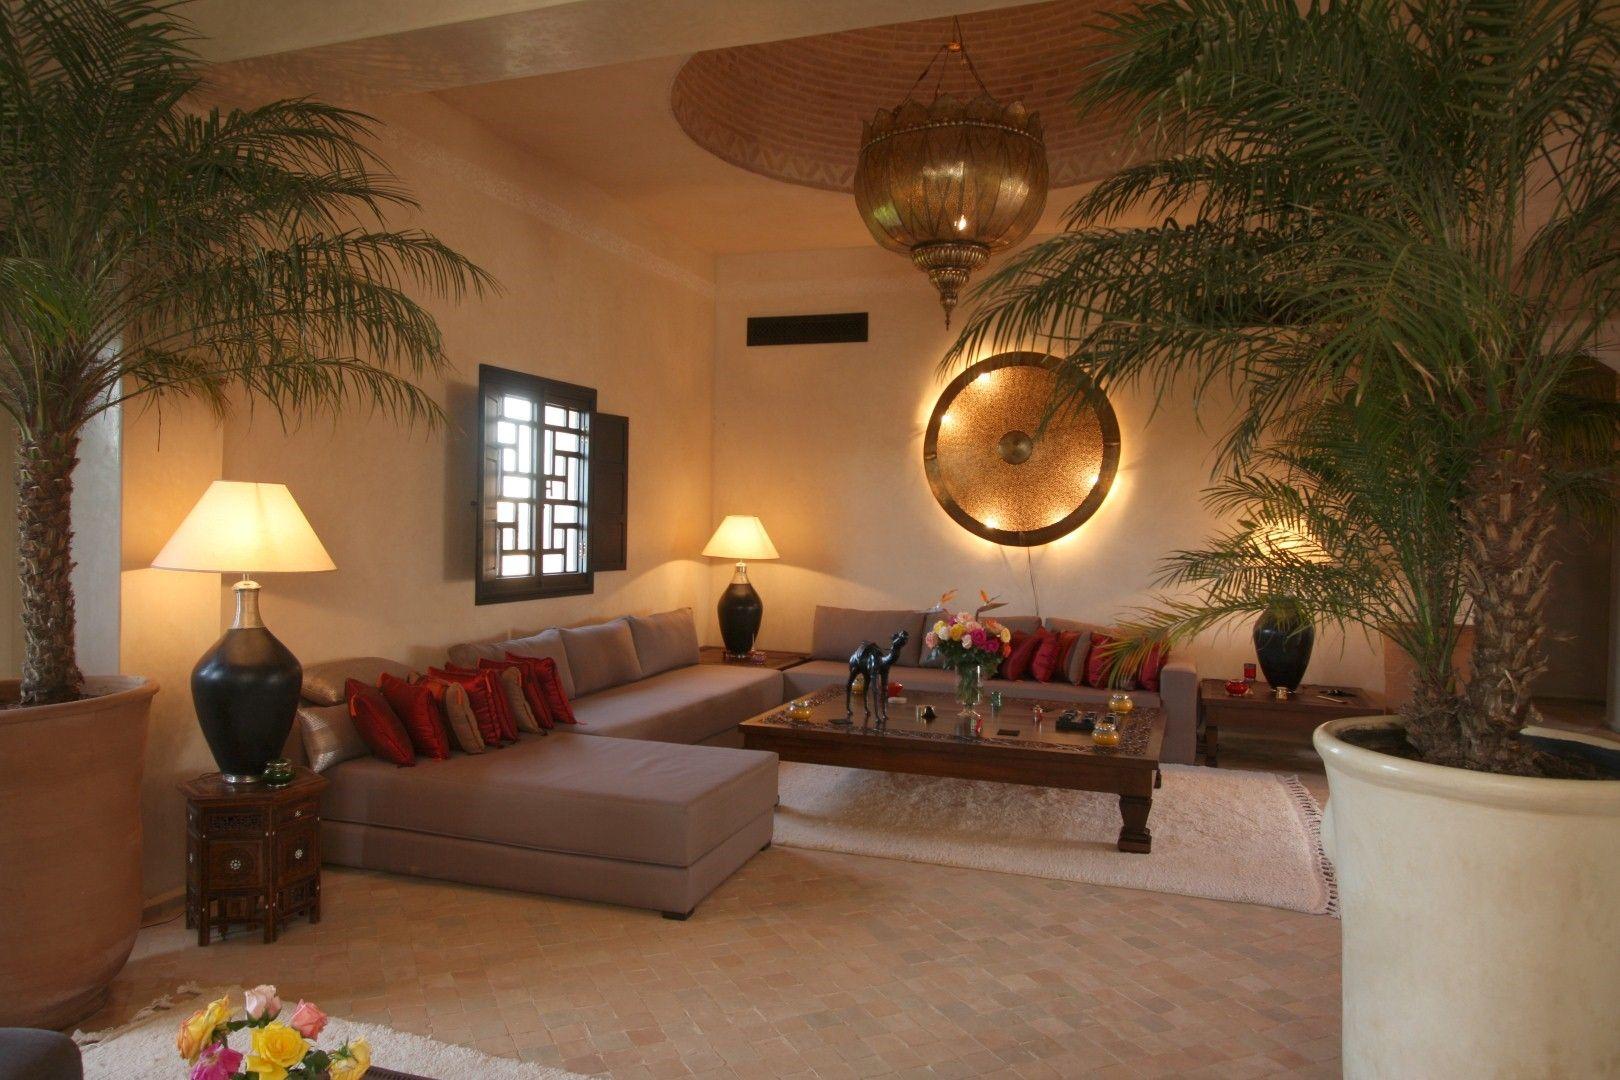 Decoration Salon Maison Algerien - valoblogi.com